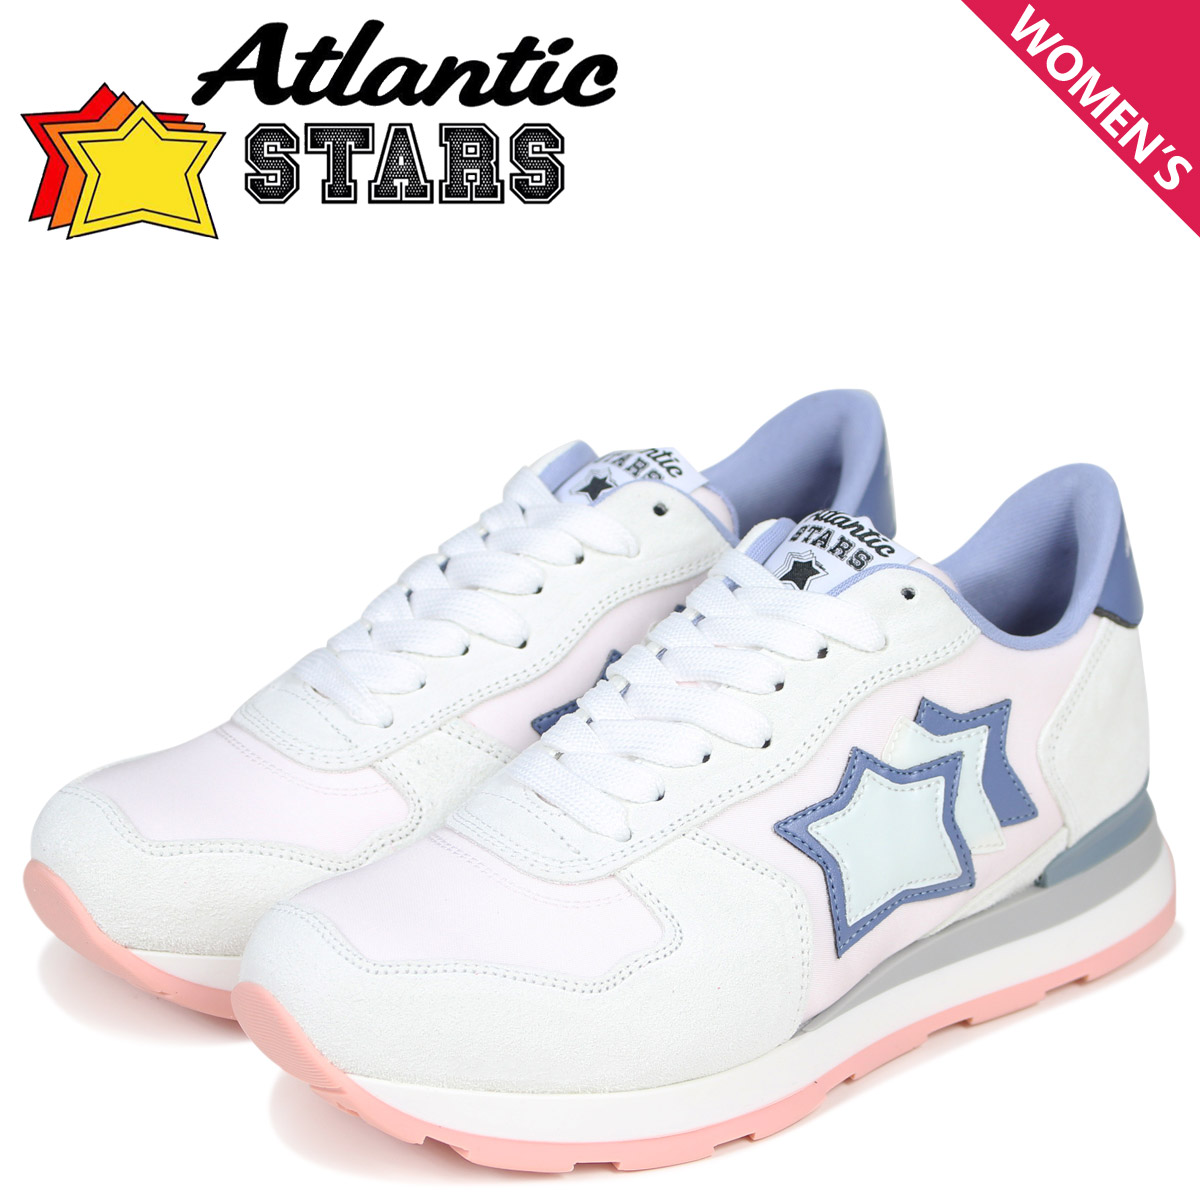 Atlantic STARS レディース スニーカー アトランティックスターズ ベガ VEGA RB29L グレー